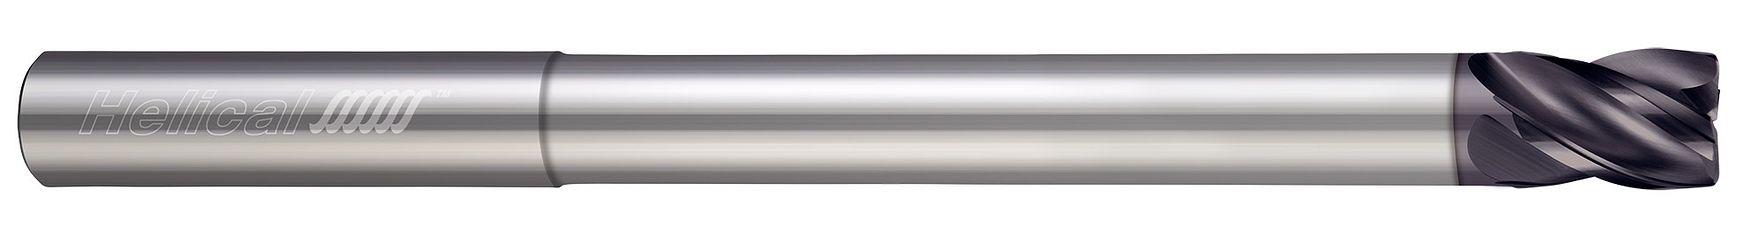 tool-details-32047